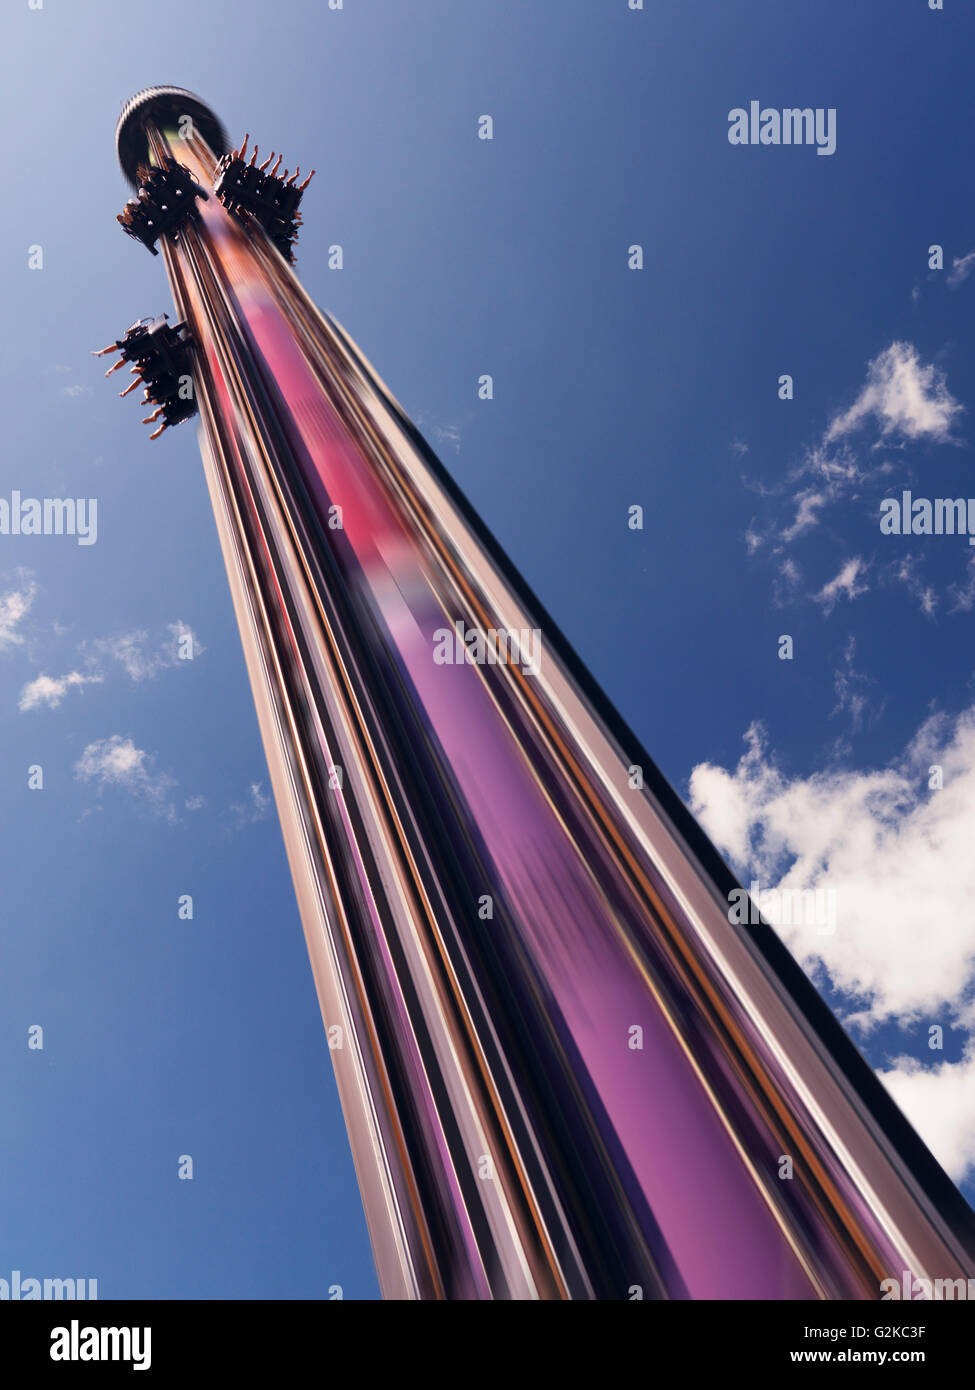 Drop Tower free fall thrill ride at Canada's Wonderland amusement park. Vaughan, Ontario, Canada, Vaughan, Ontario - Stock Image